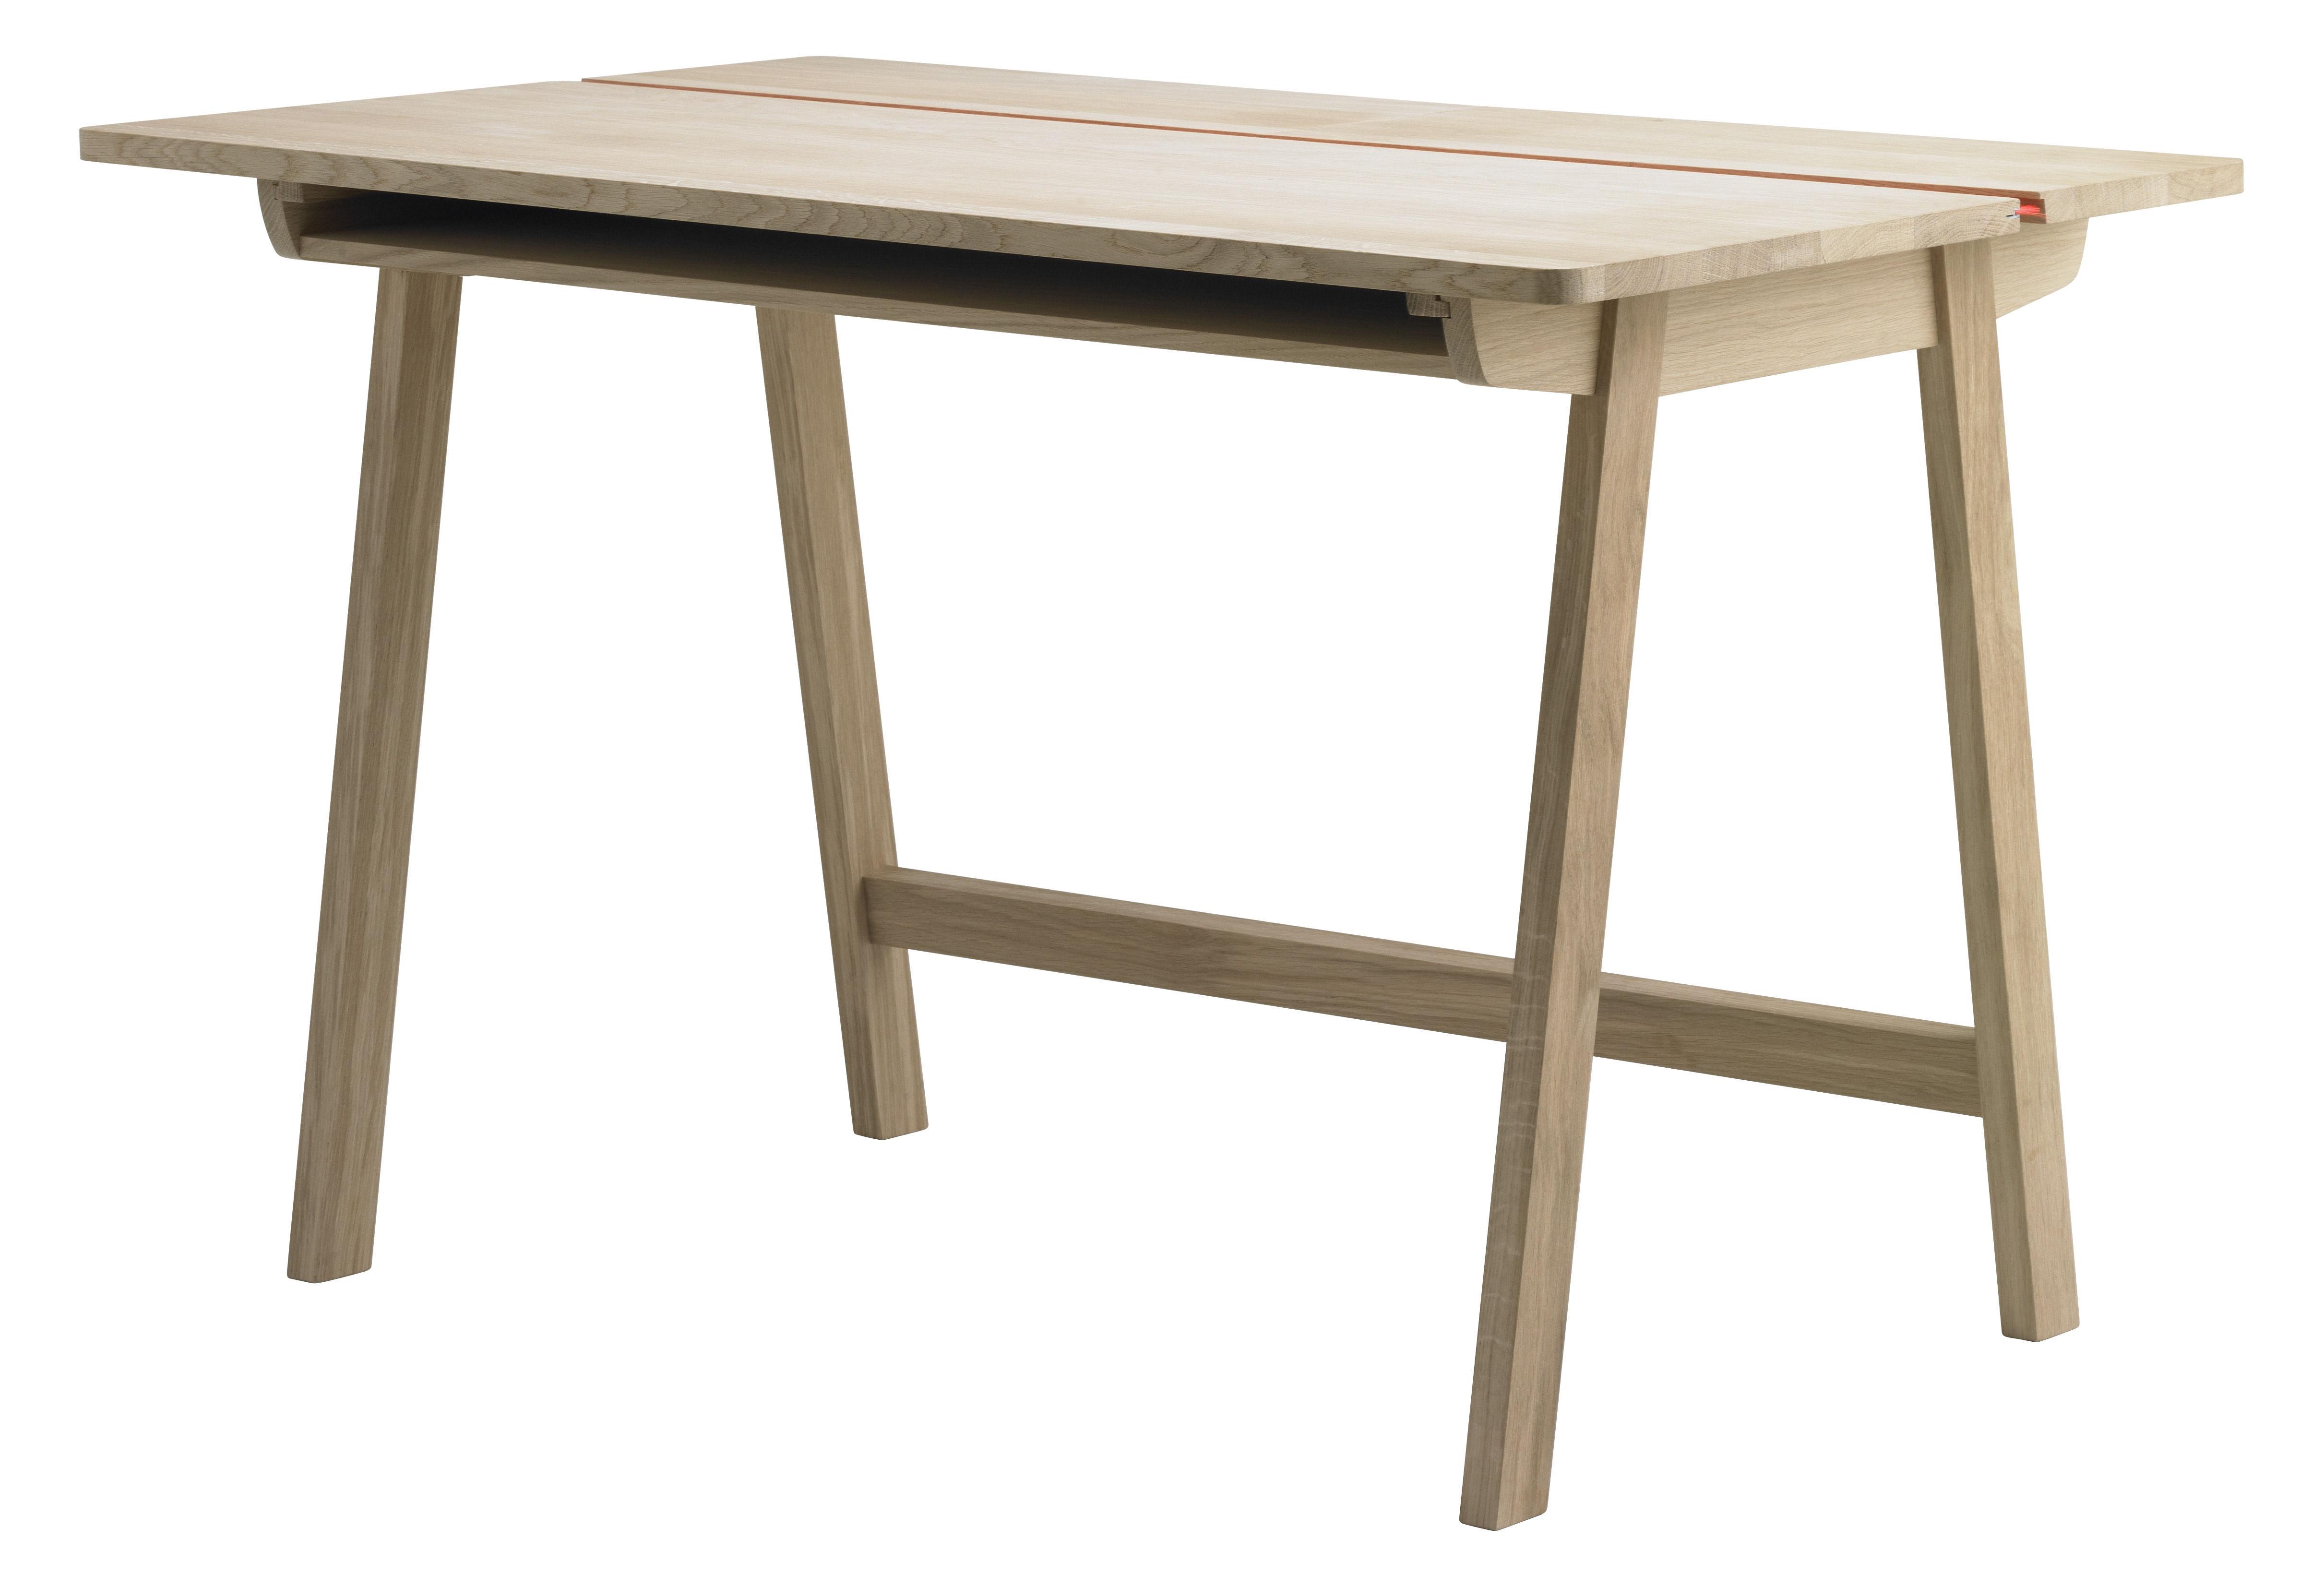 bureau landa l 120 cm 120 x 70 5 cm ch ne naturel alki. Black Bedroom Furniture Sets. Home Design Ideas